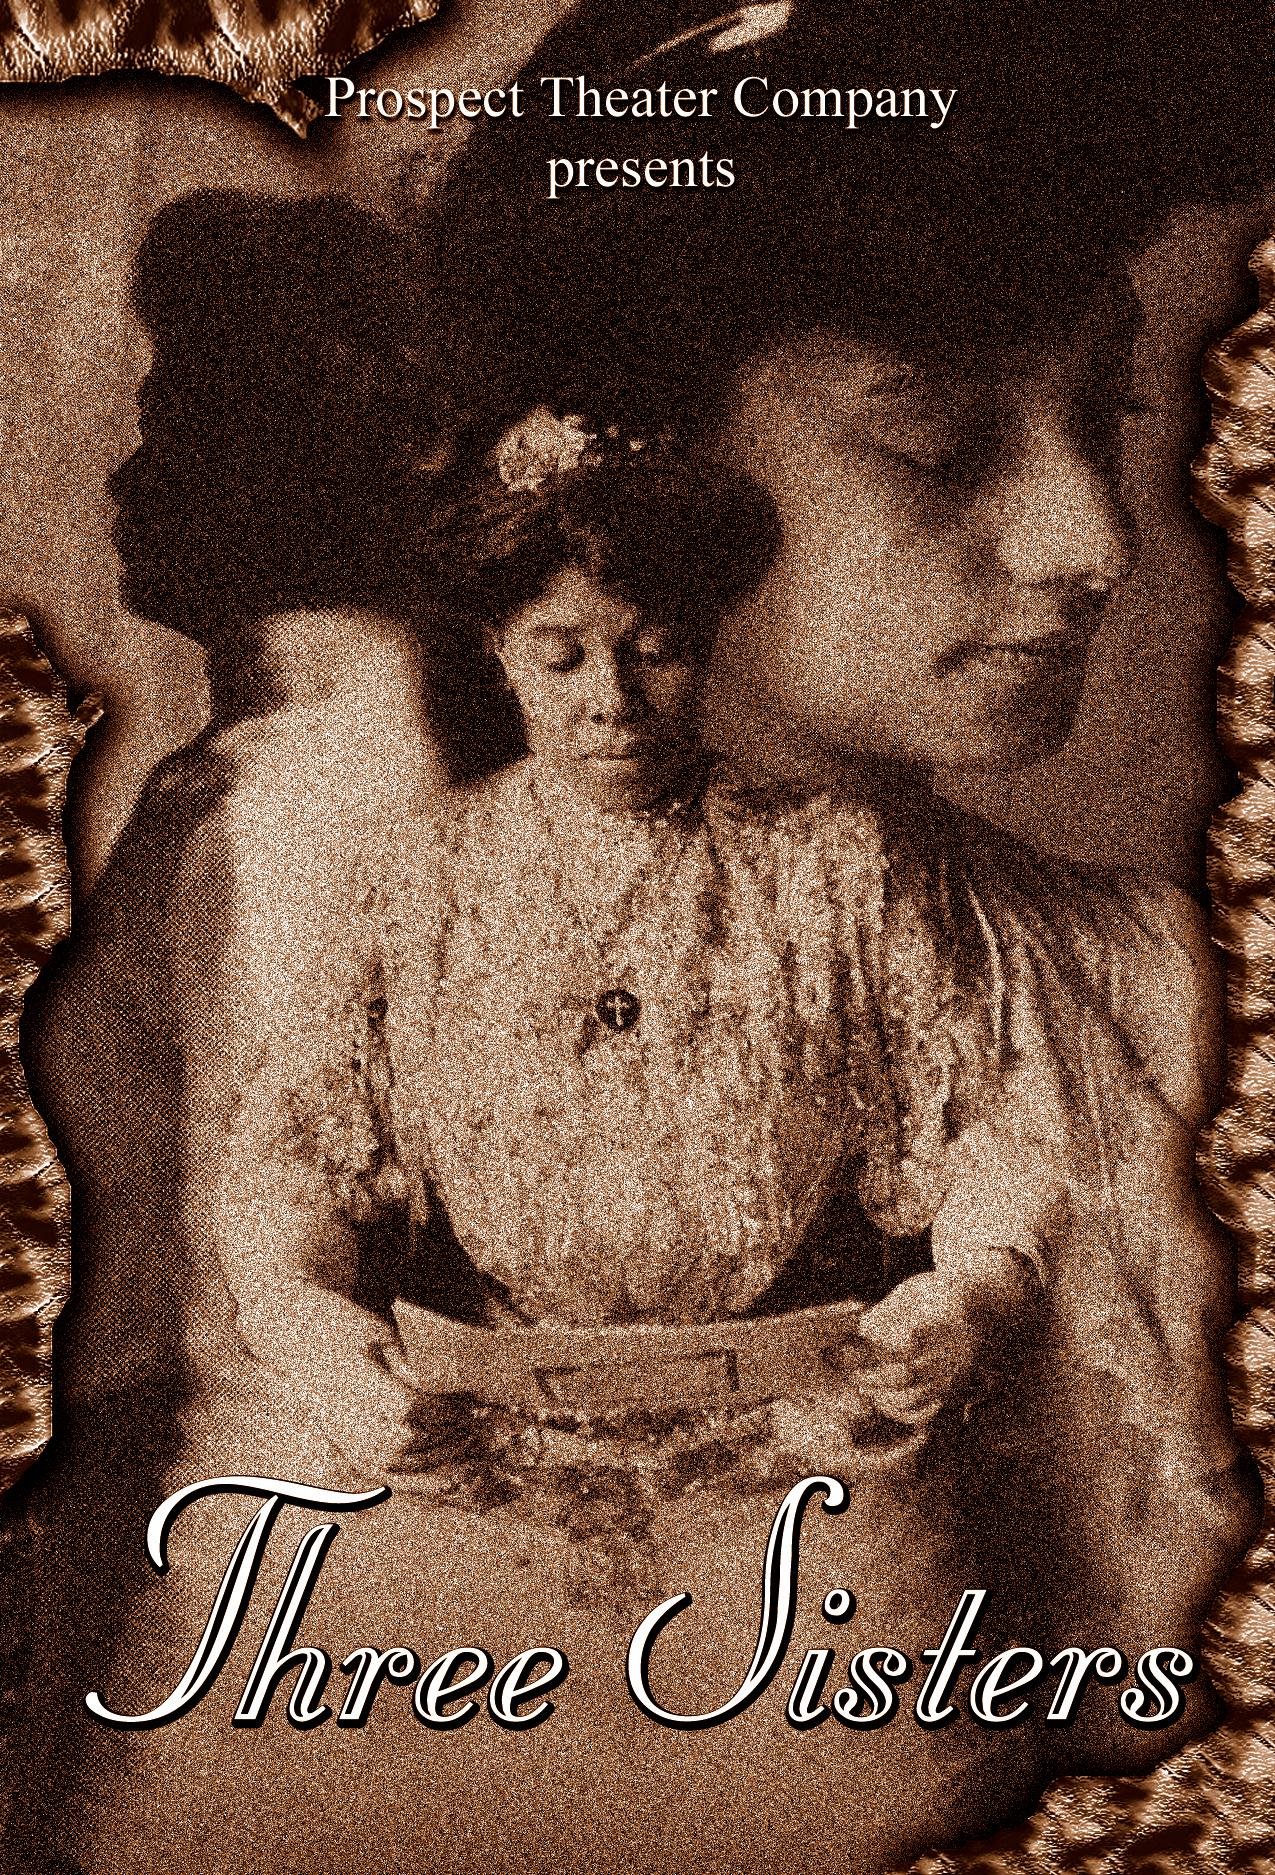 Three Sisters (2002)